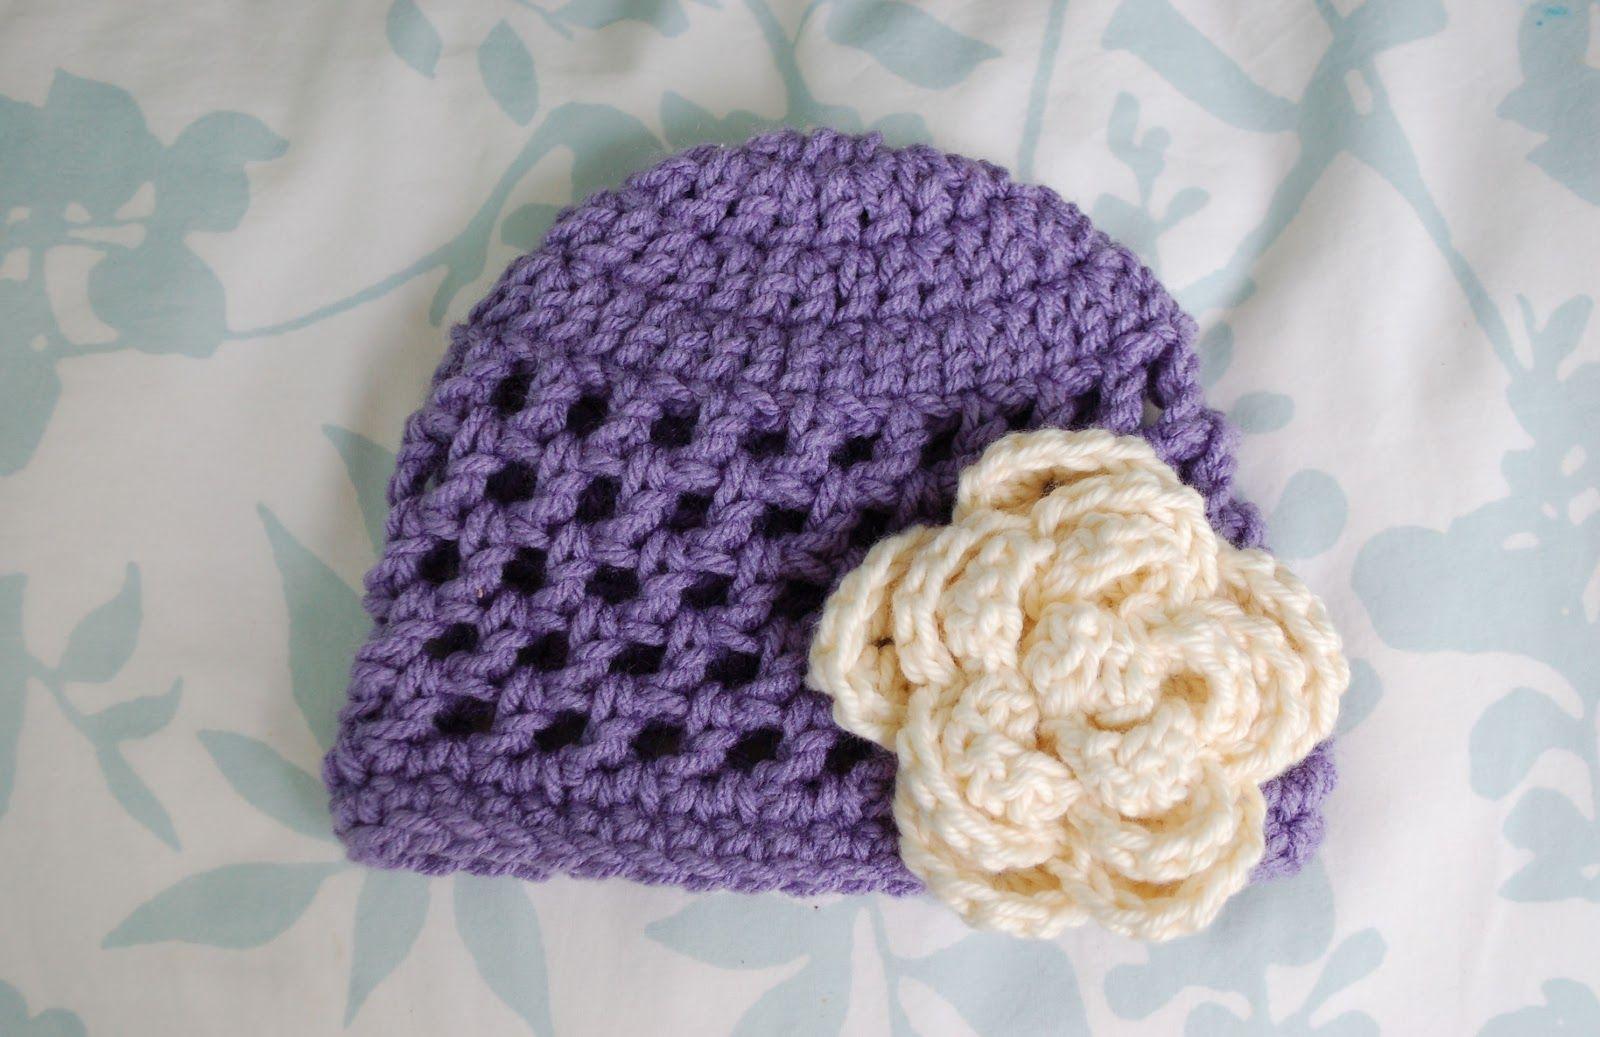 Crochet flower patterns to print free pattern open stitch hat crochet flower patterns to print free pattern open stitch hat newborn bankloansurffo Choice Image